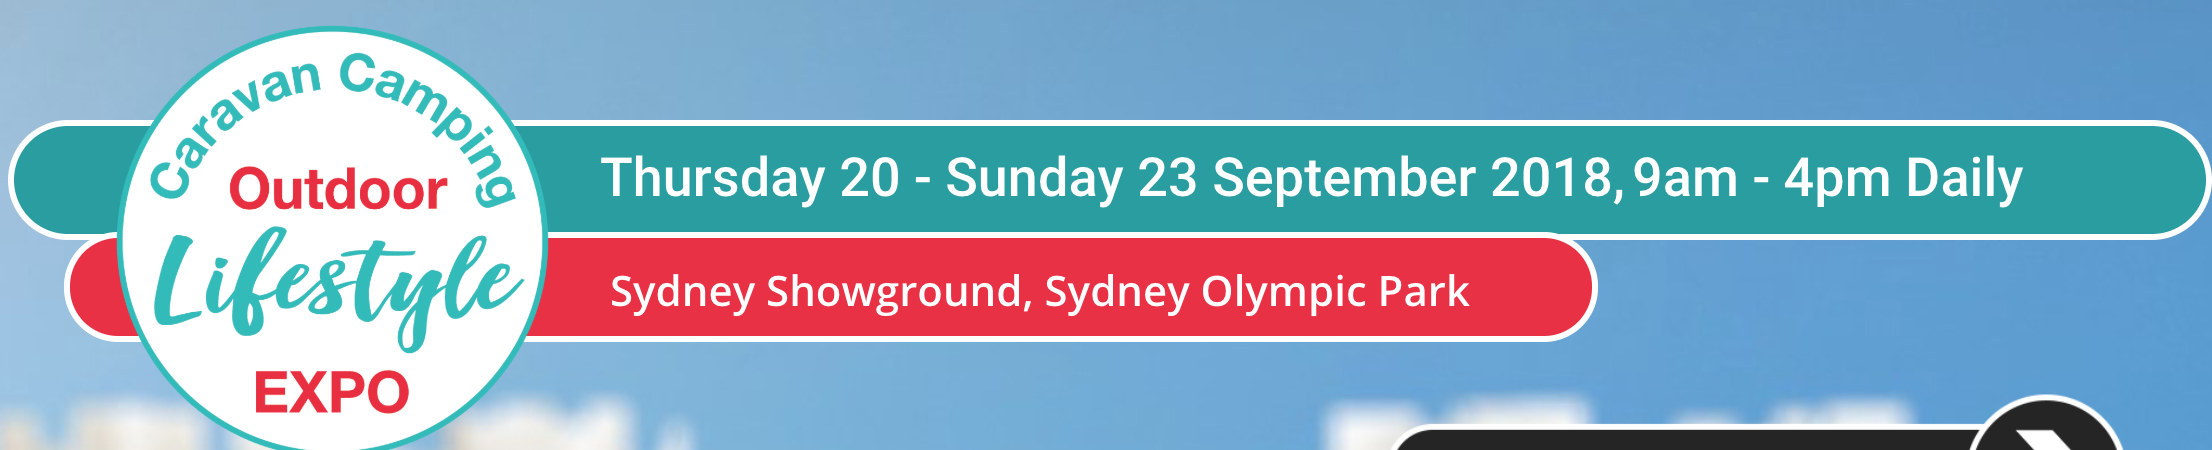 VanEssa mobilcamping at Sydney Caravan & Camping Show 2018.png